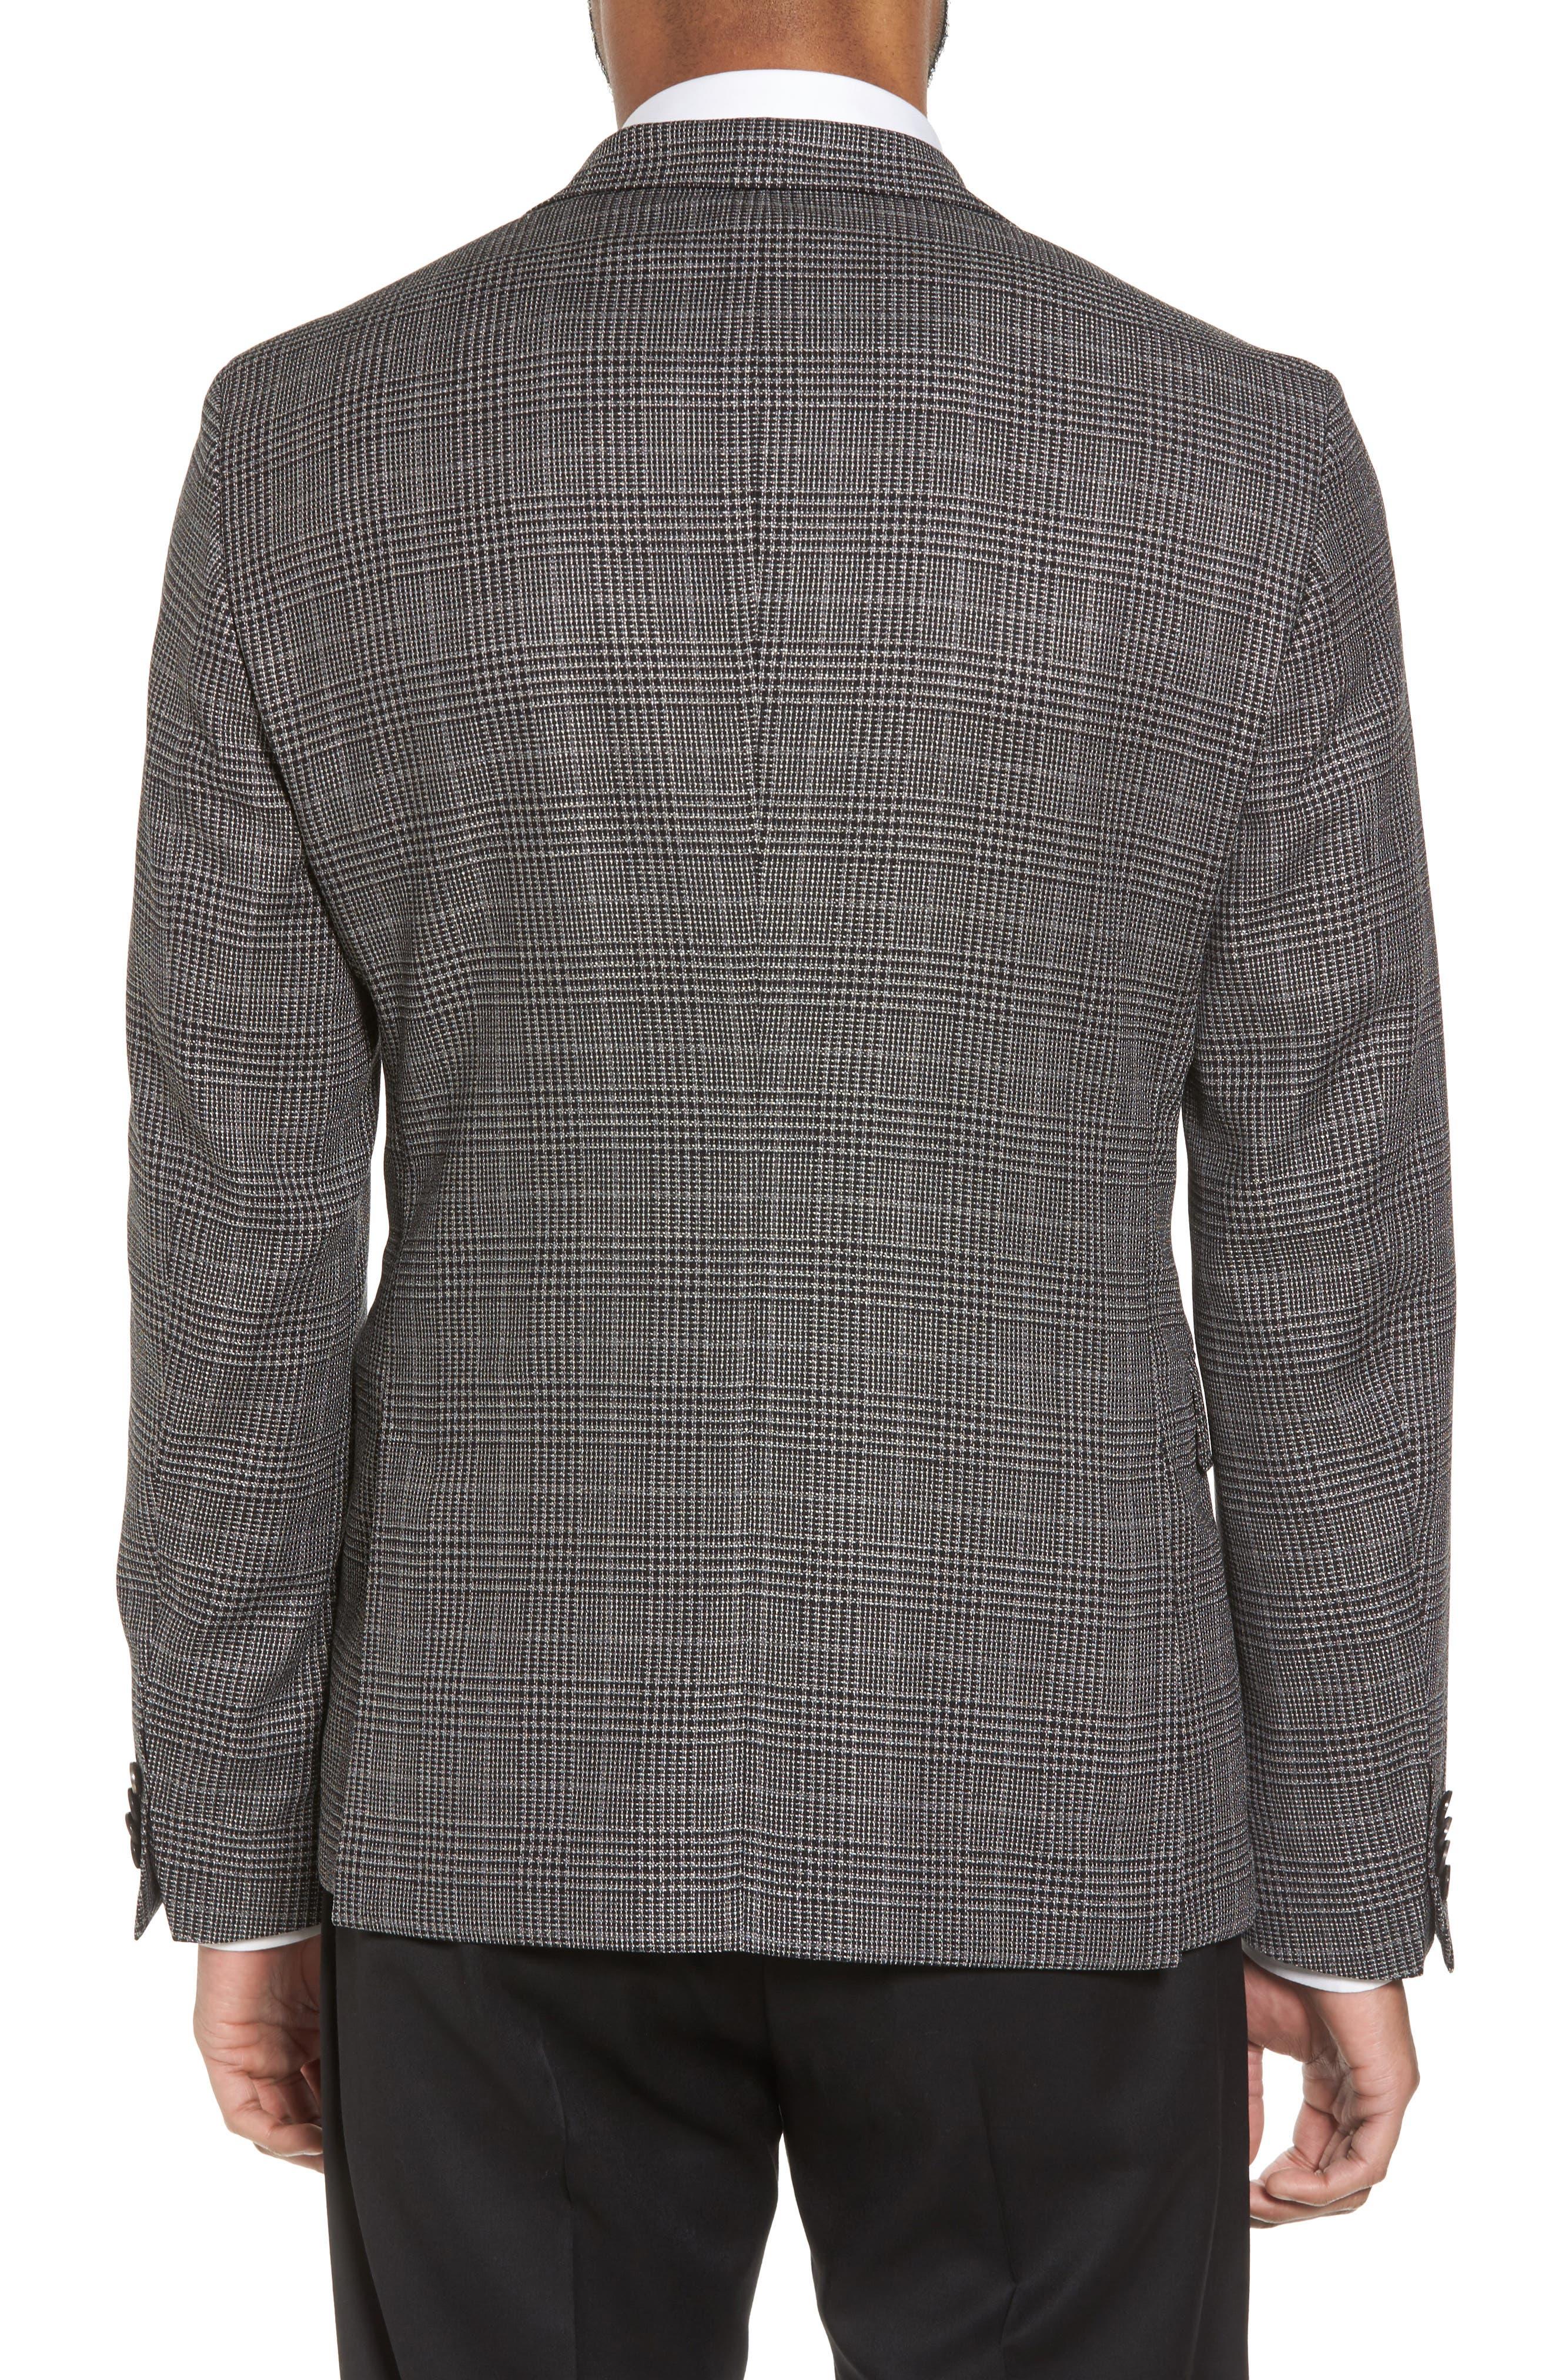 Alternate Image 2  - BOSS Nobis Trim Fit Plaid Wool & Silk Blend Sport Coat